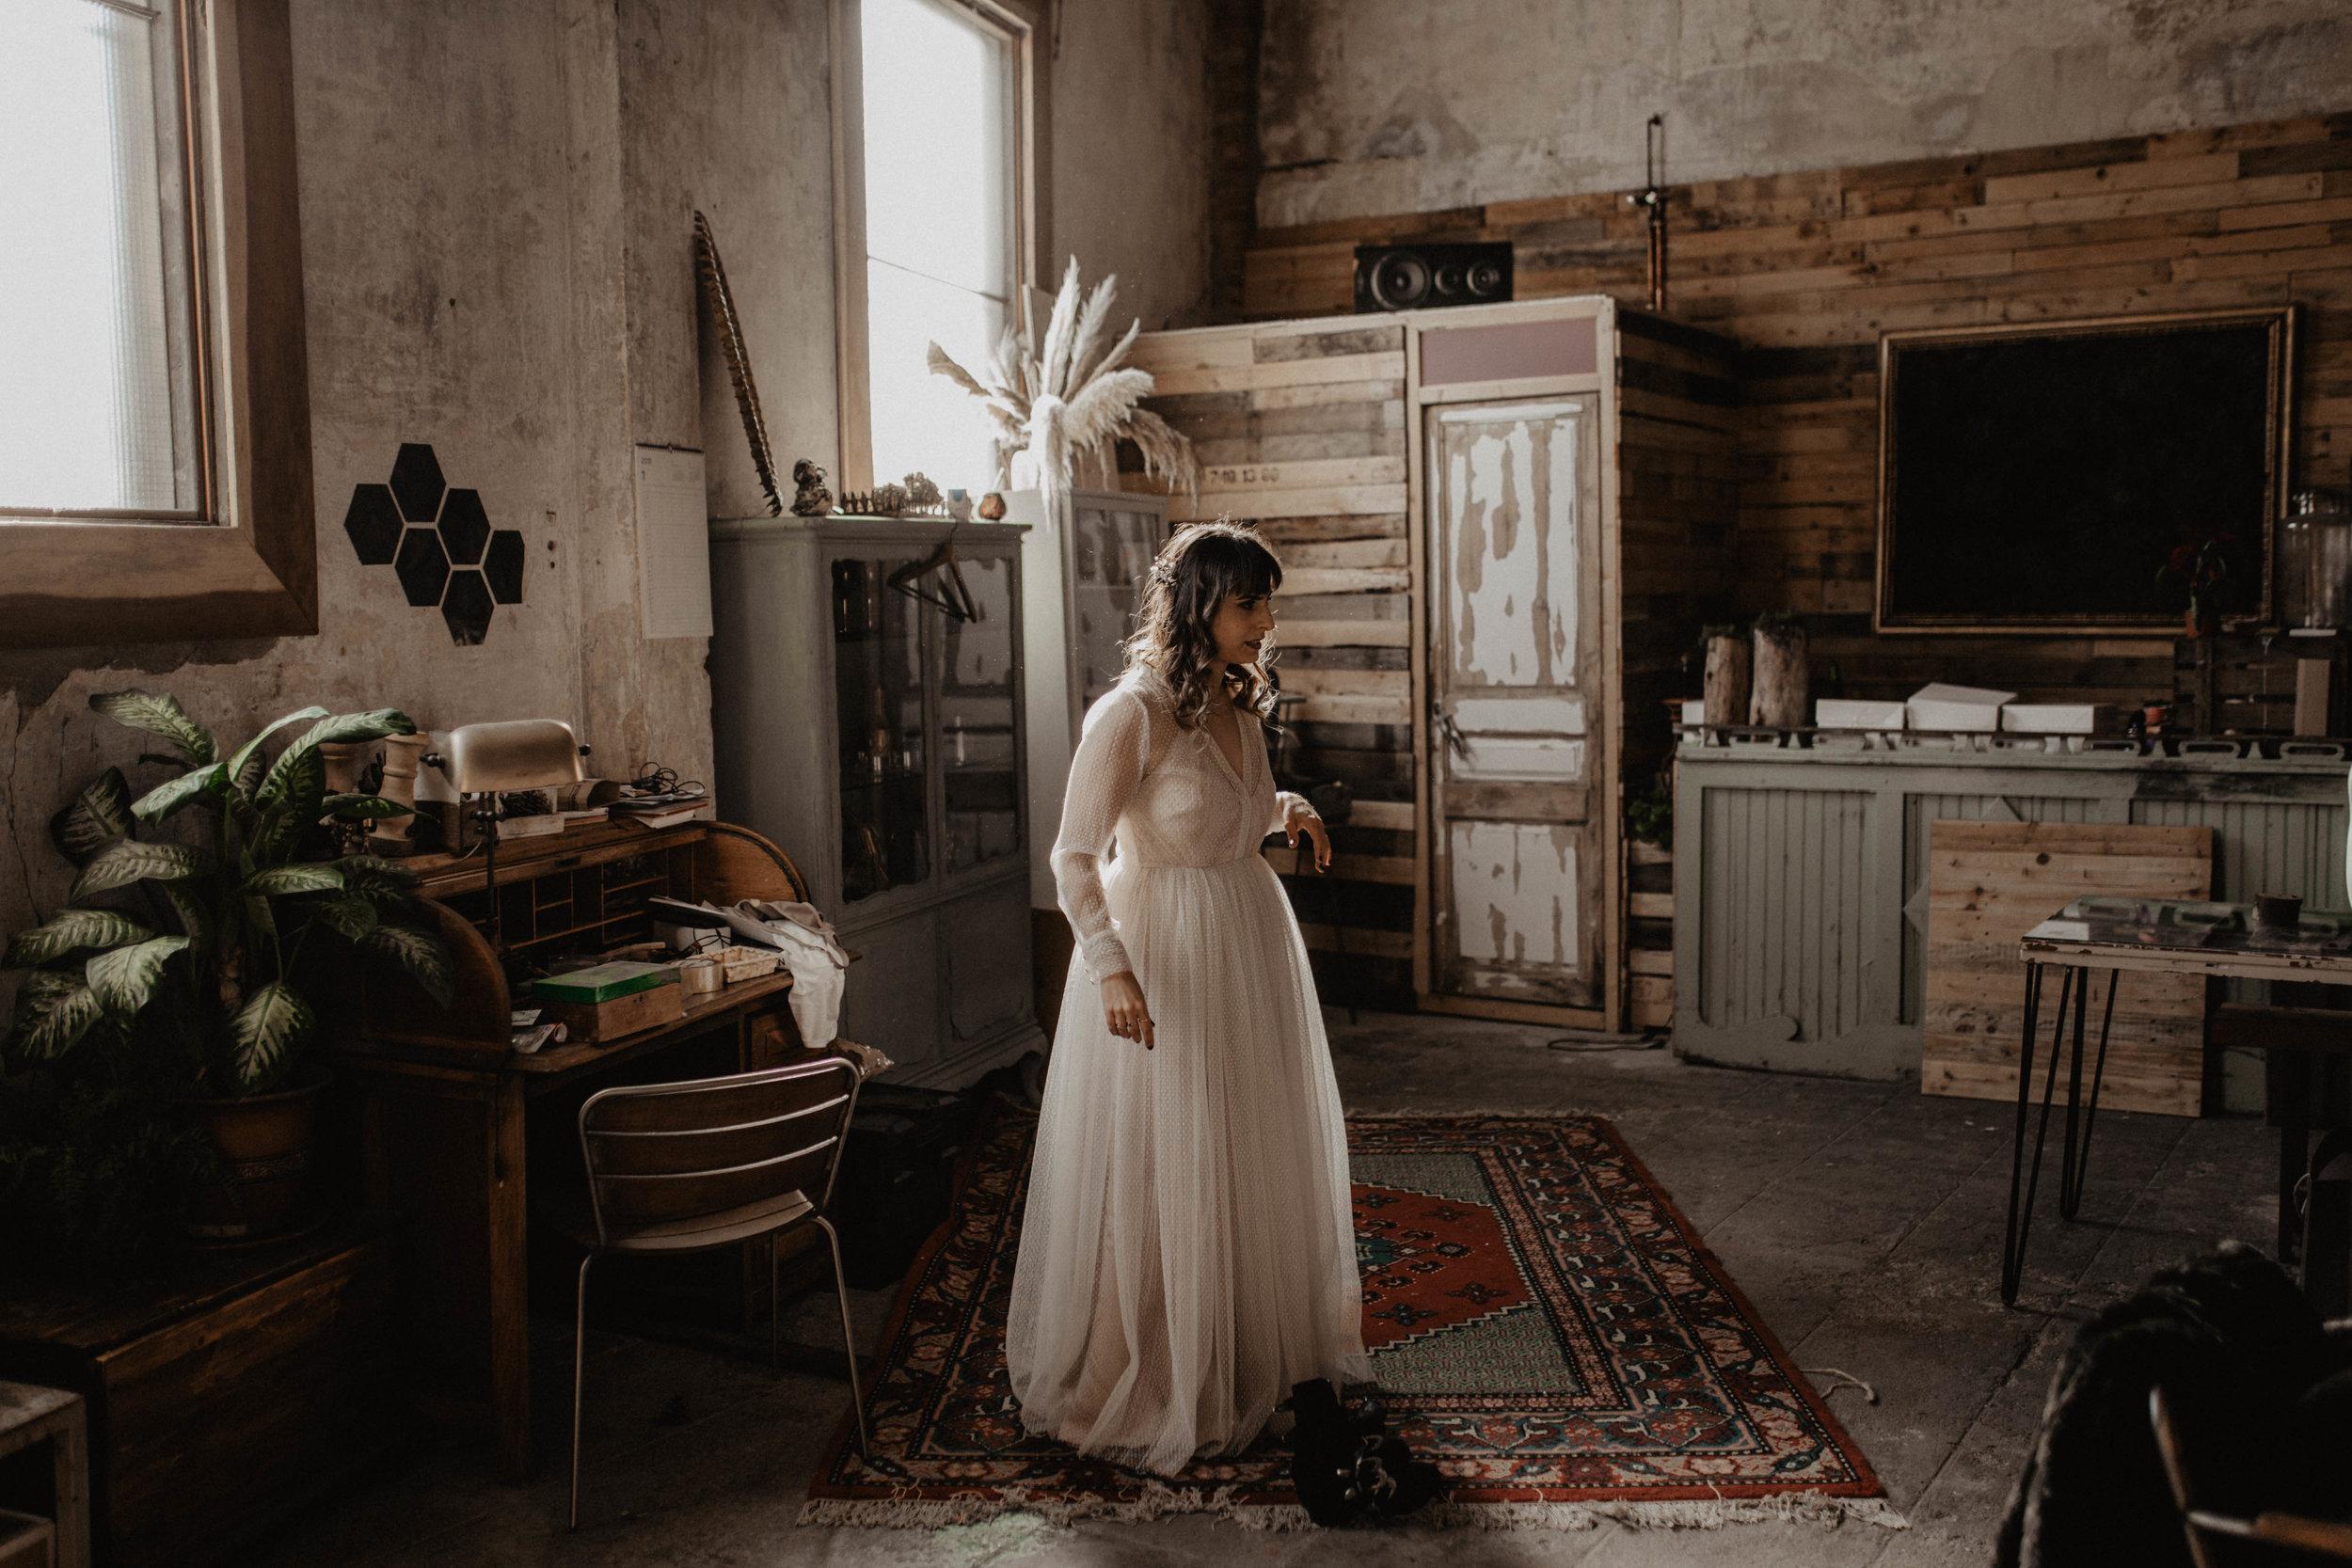 thenortherngirlphotography-photography-weddingphotography-couple-bodasconestilo-bodasenbarcelona-martadavid-175.jpg